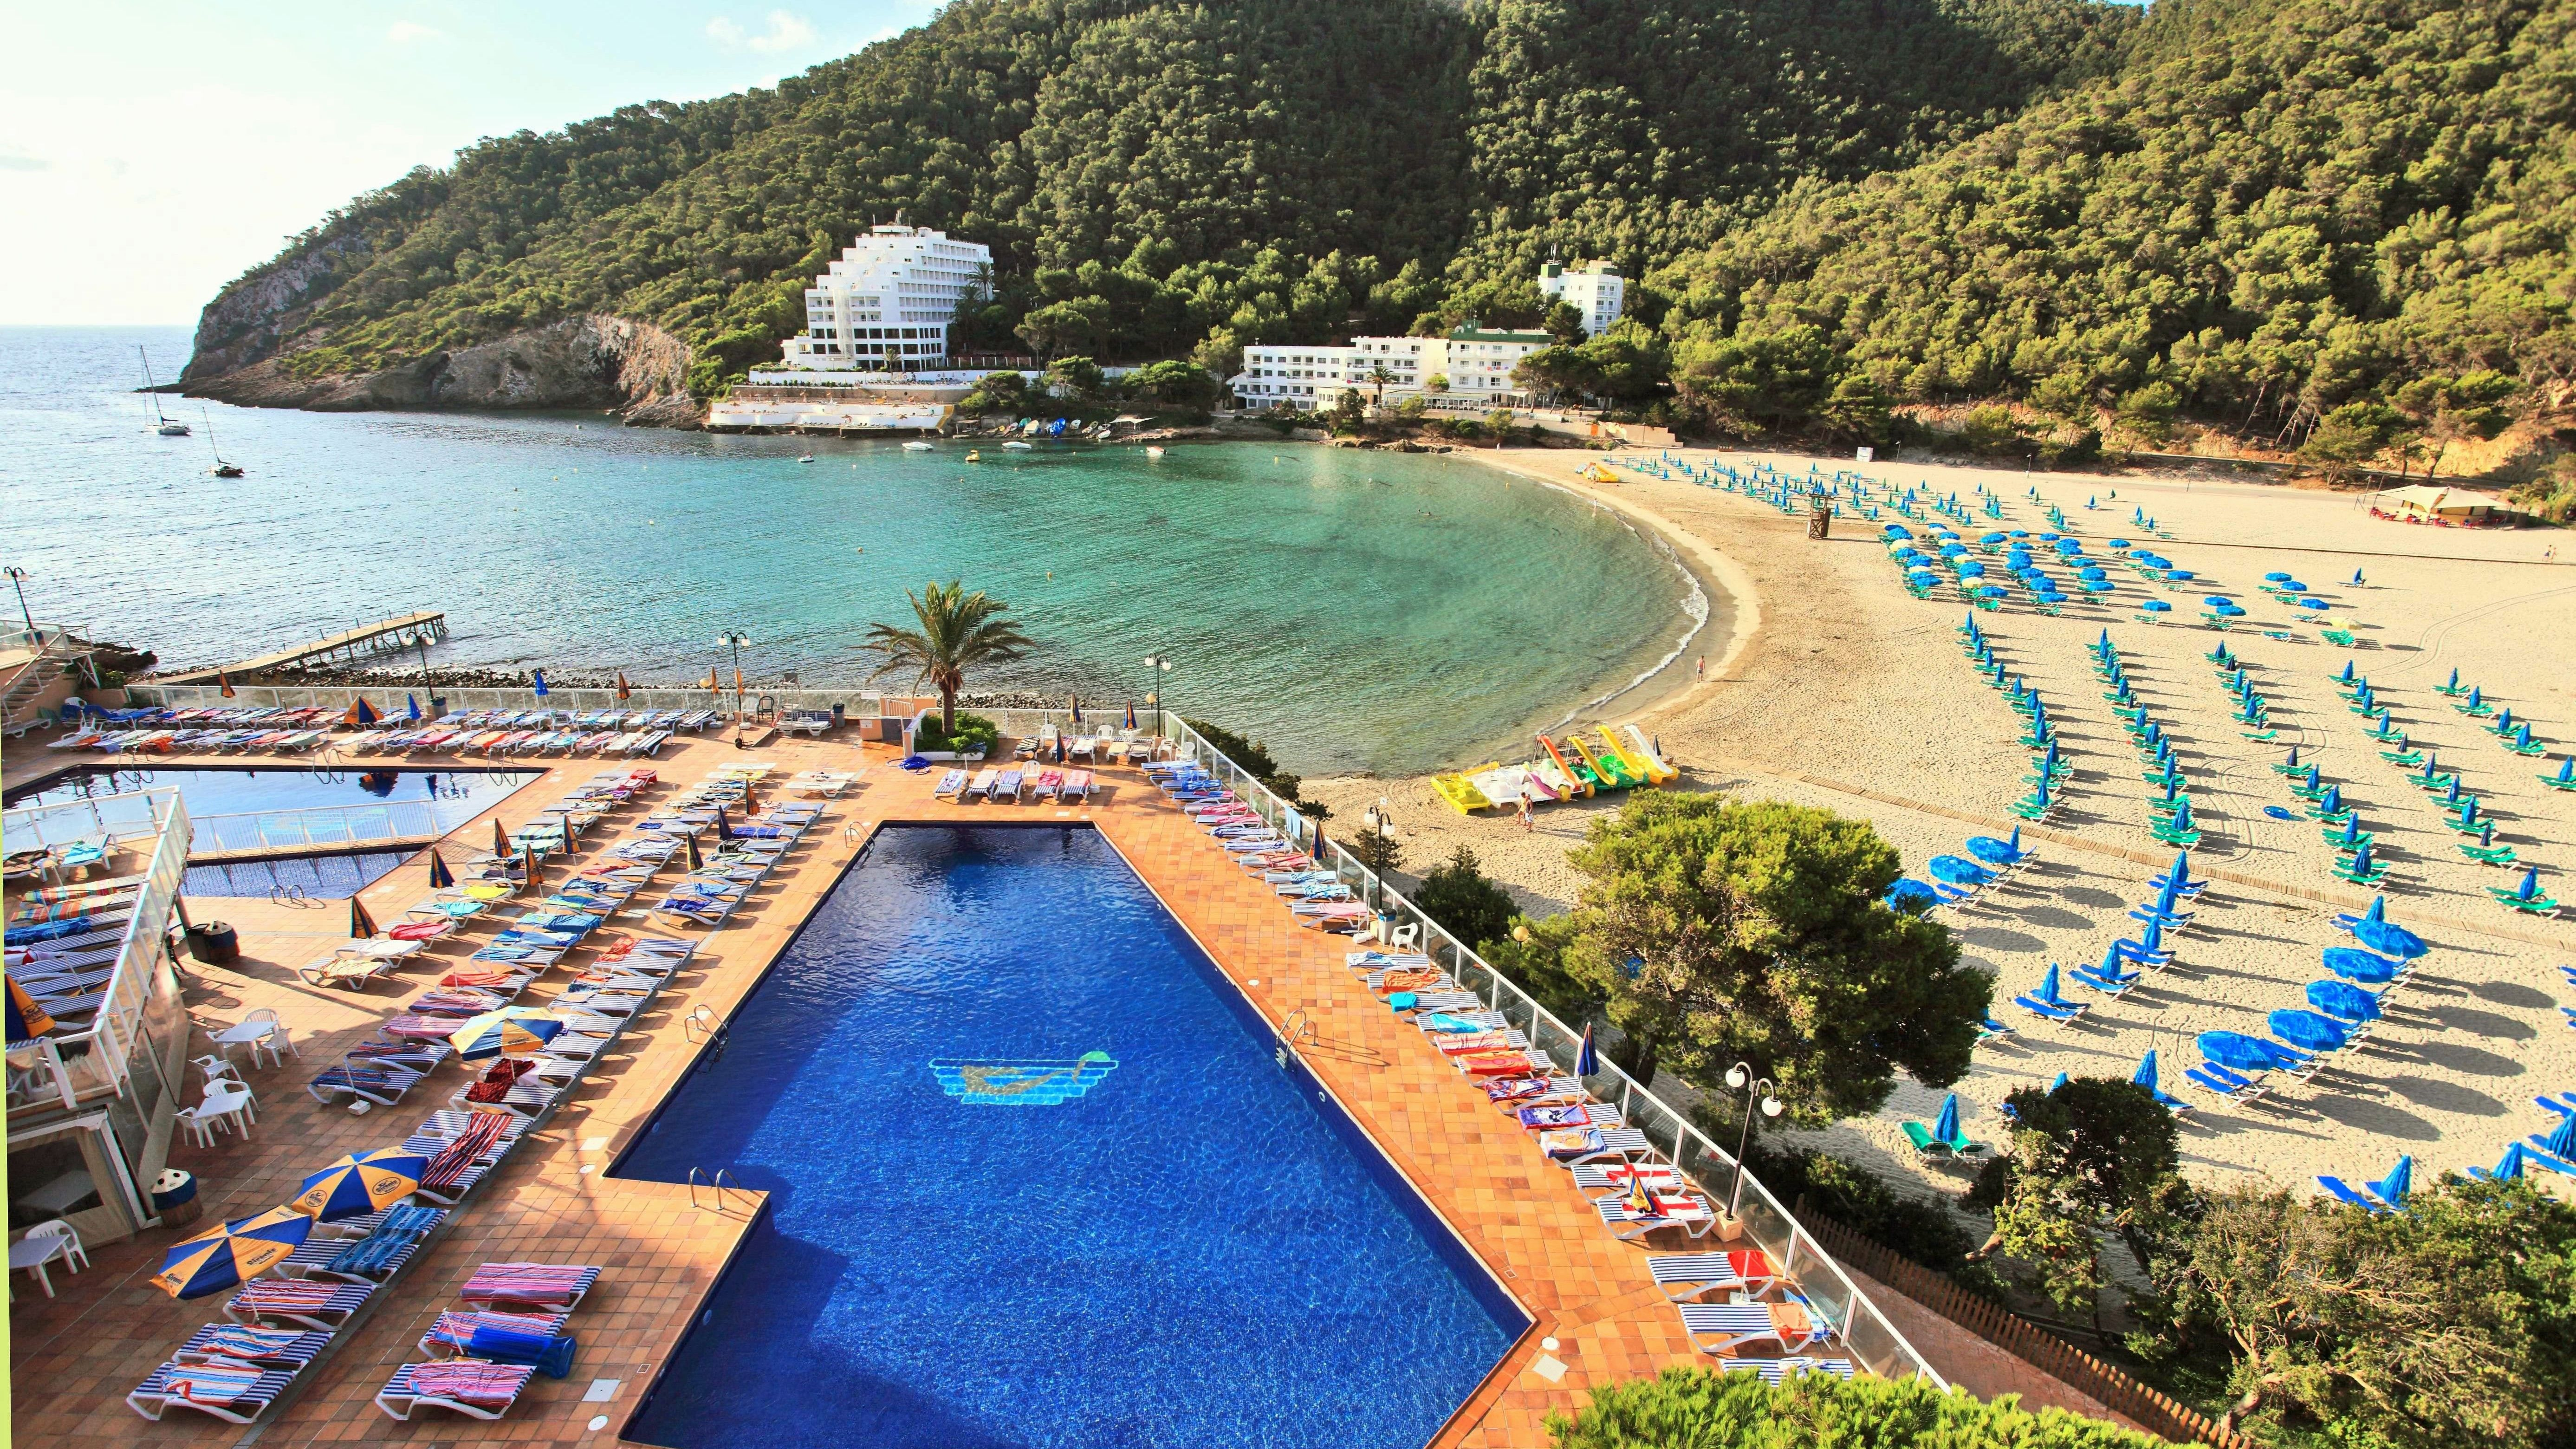 Spain, Balearic Islands, Ibiza, Cala Llonga, Sirenis Cala